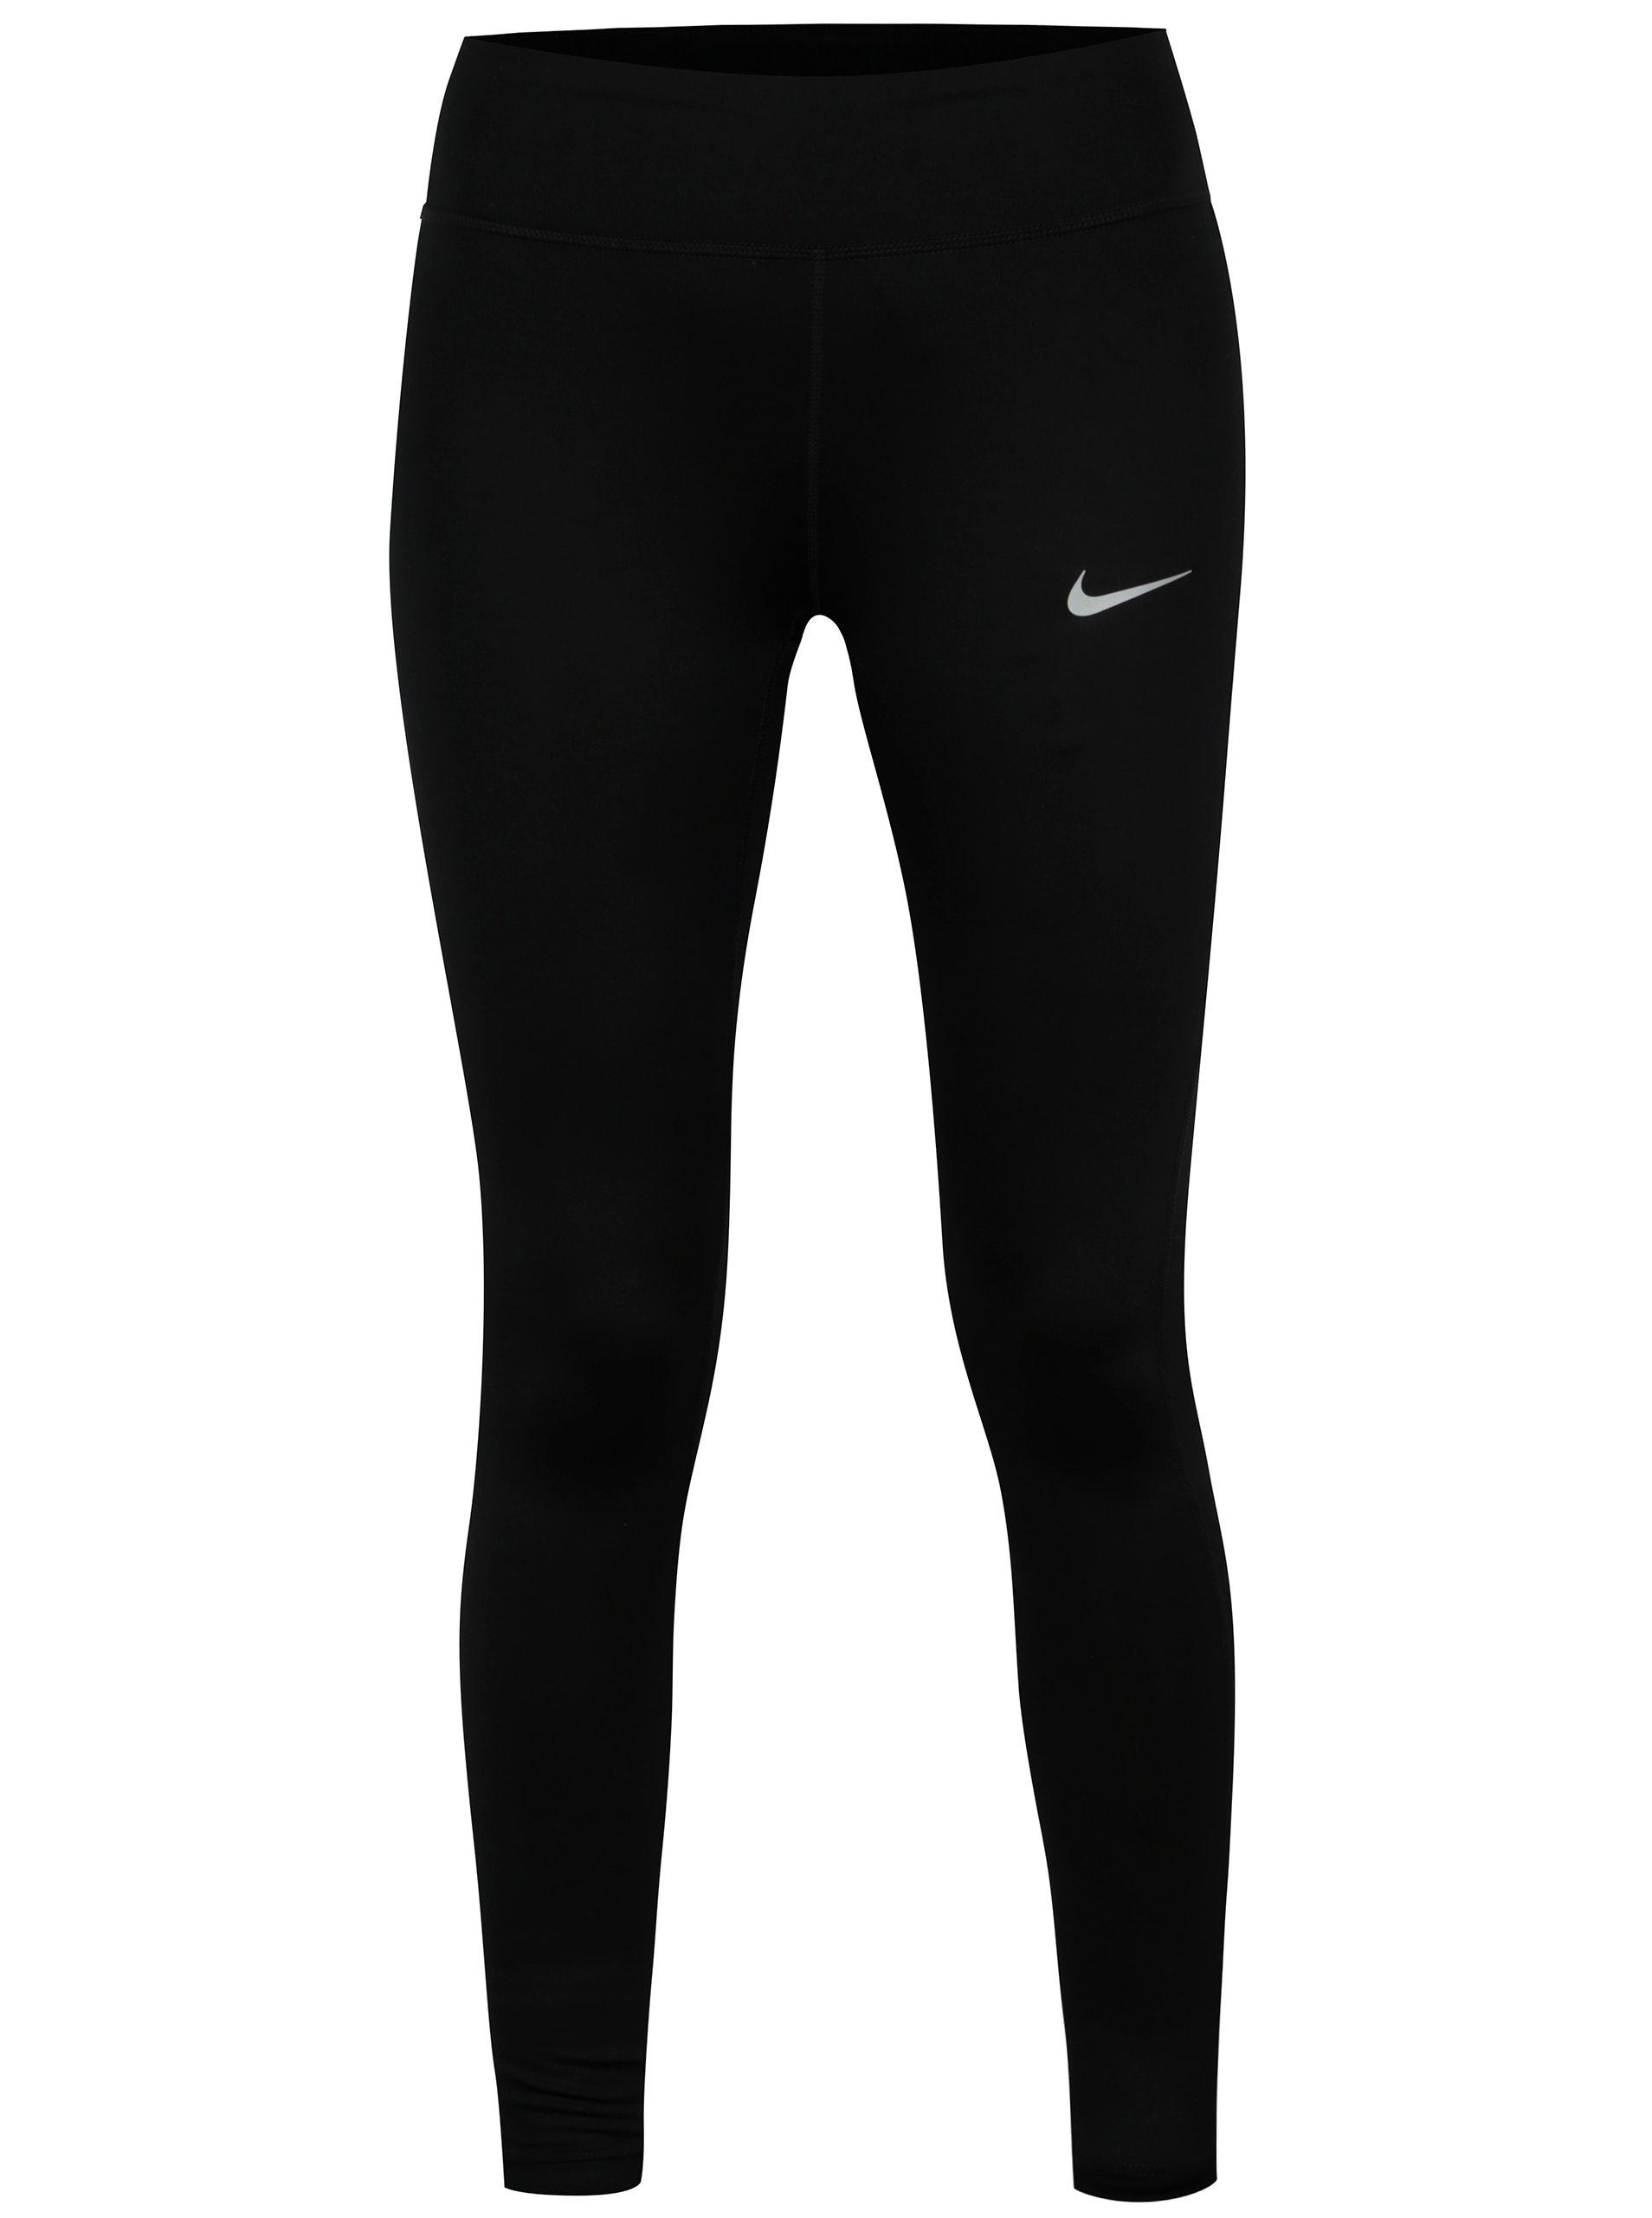 Čierne skrátené dámske funkčné legíny Nike PWR ESSNTL TGHT ... 8d8b1a4c3f